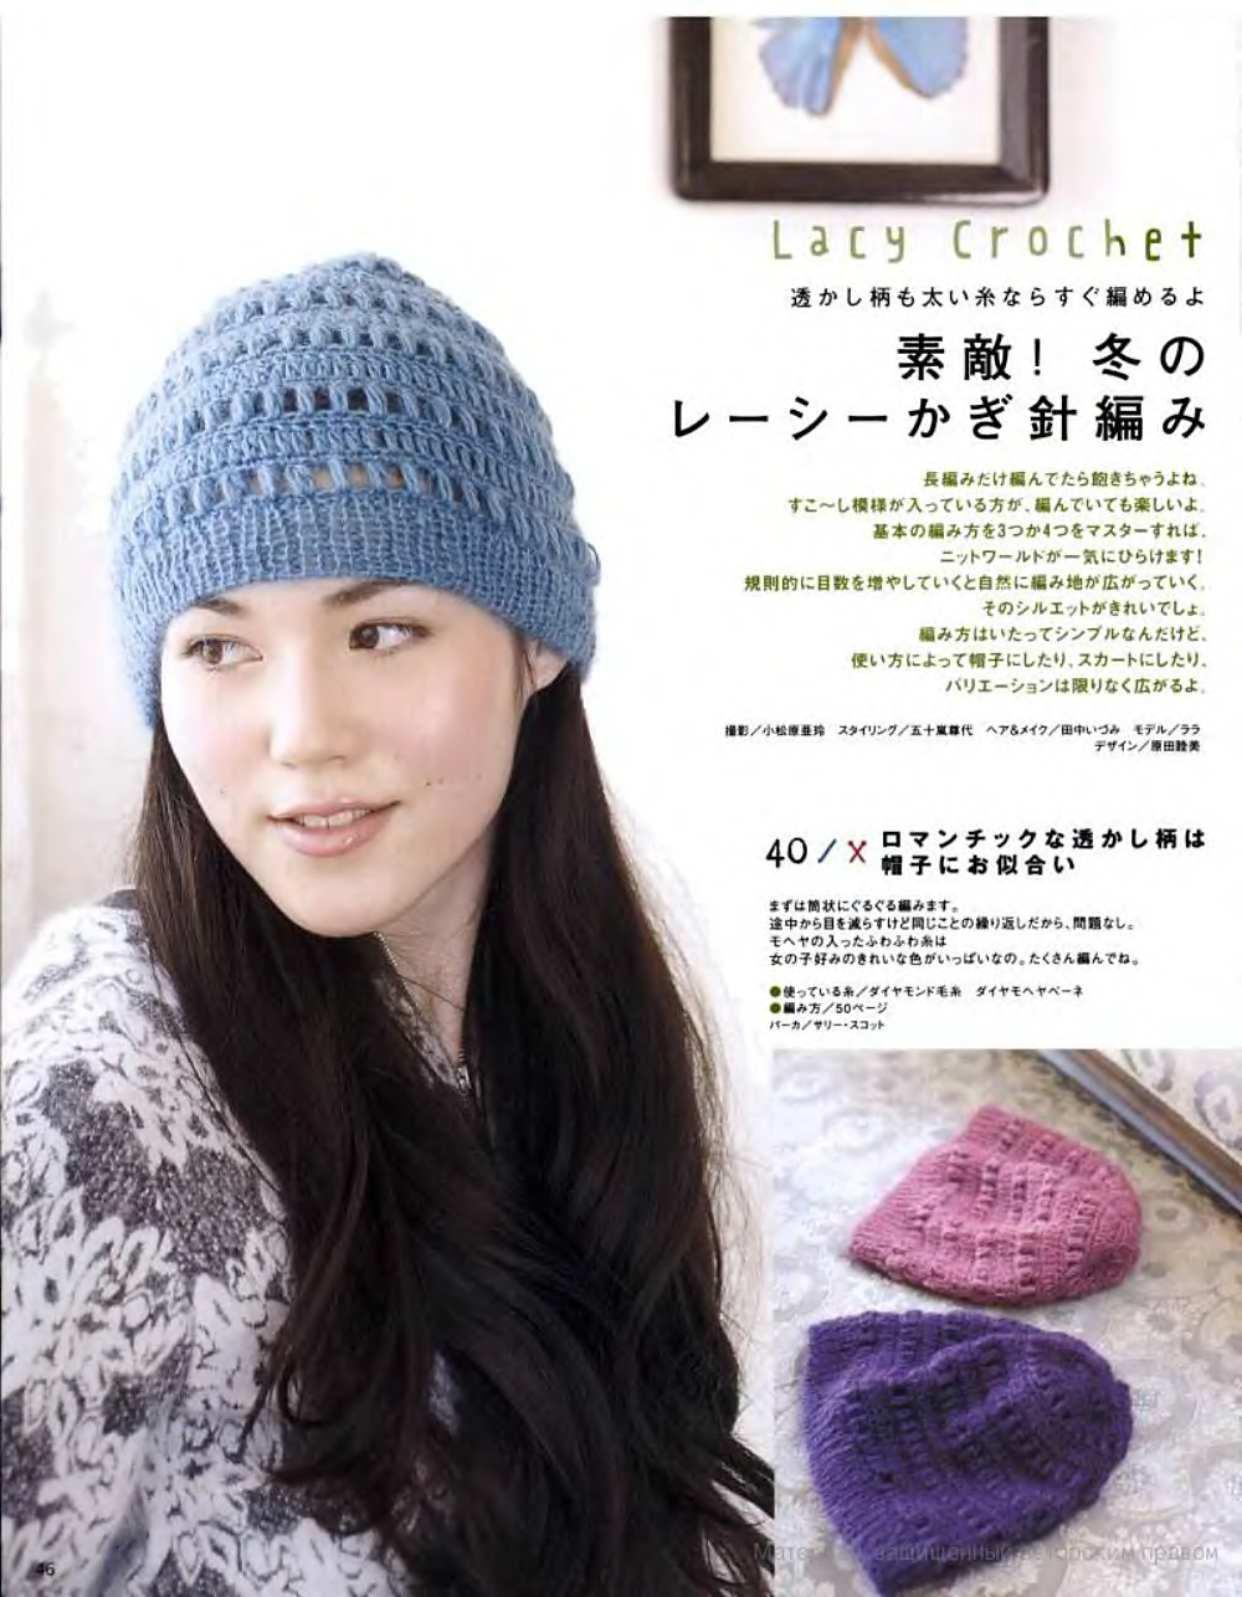 Let_s_knit_series_NV4324_2007_Autumn_Winter_sp-kr_44.png